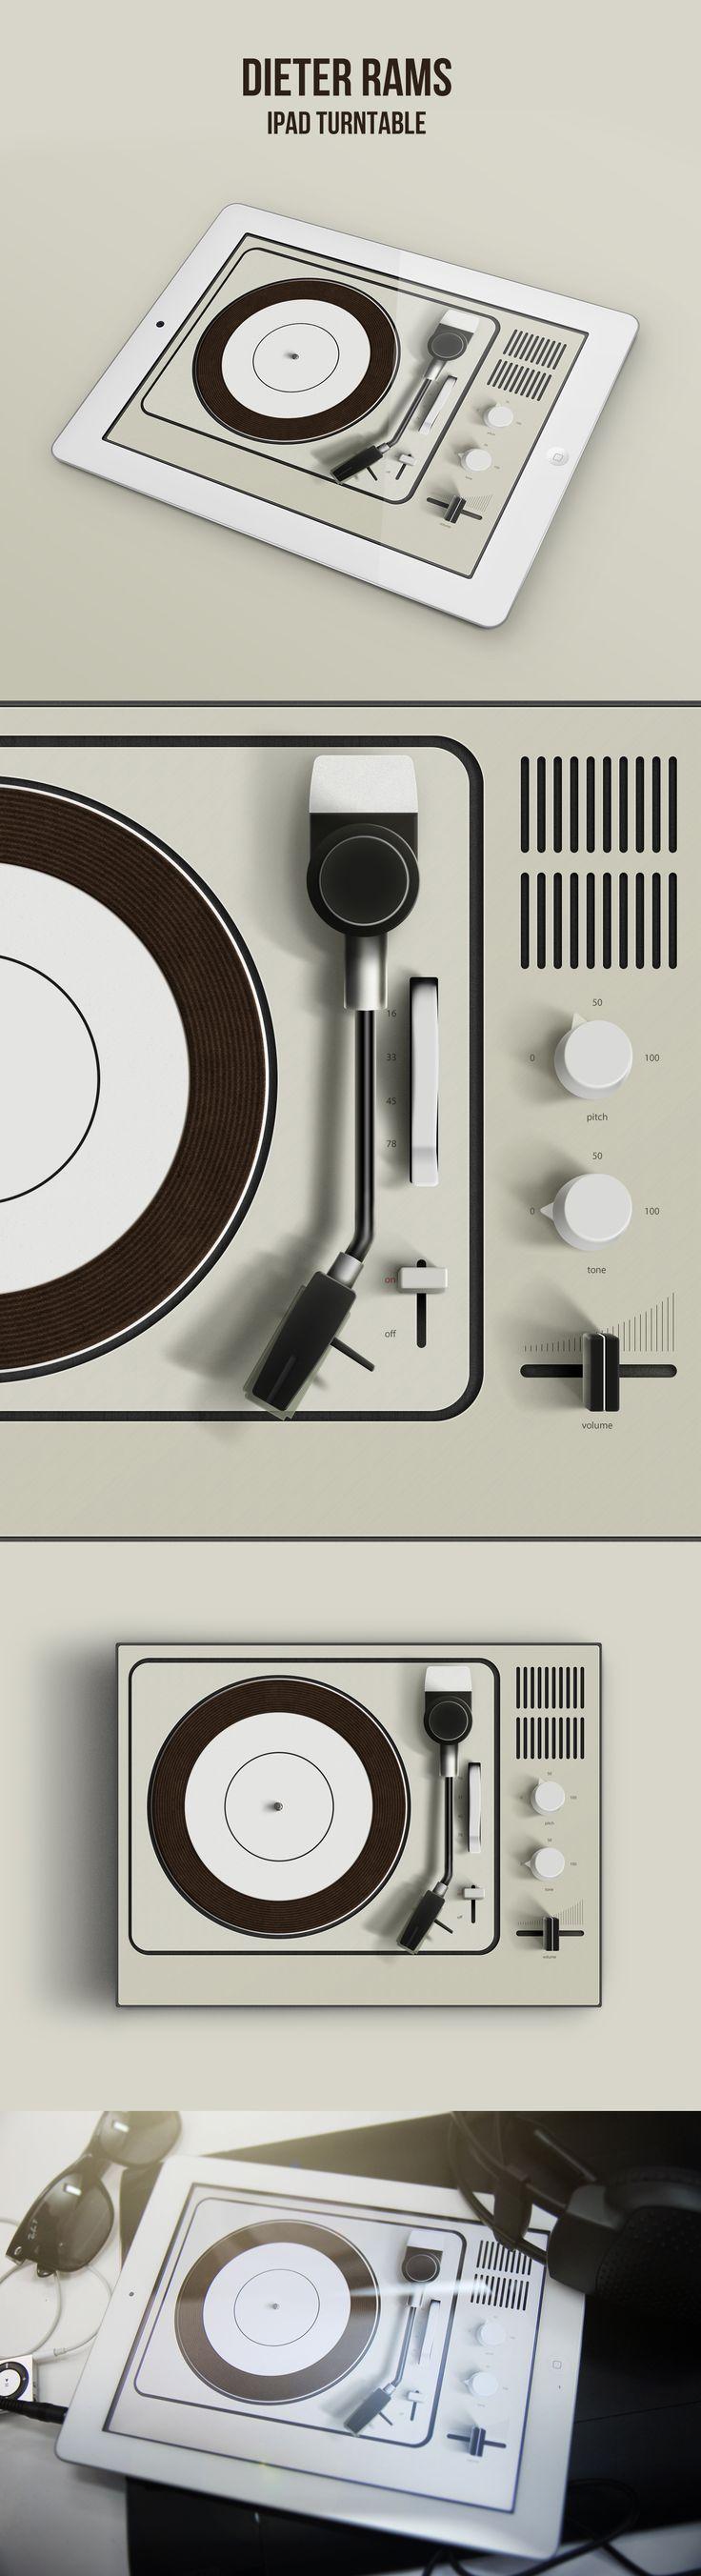 Dieter Rams iPad Turntable